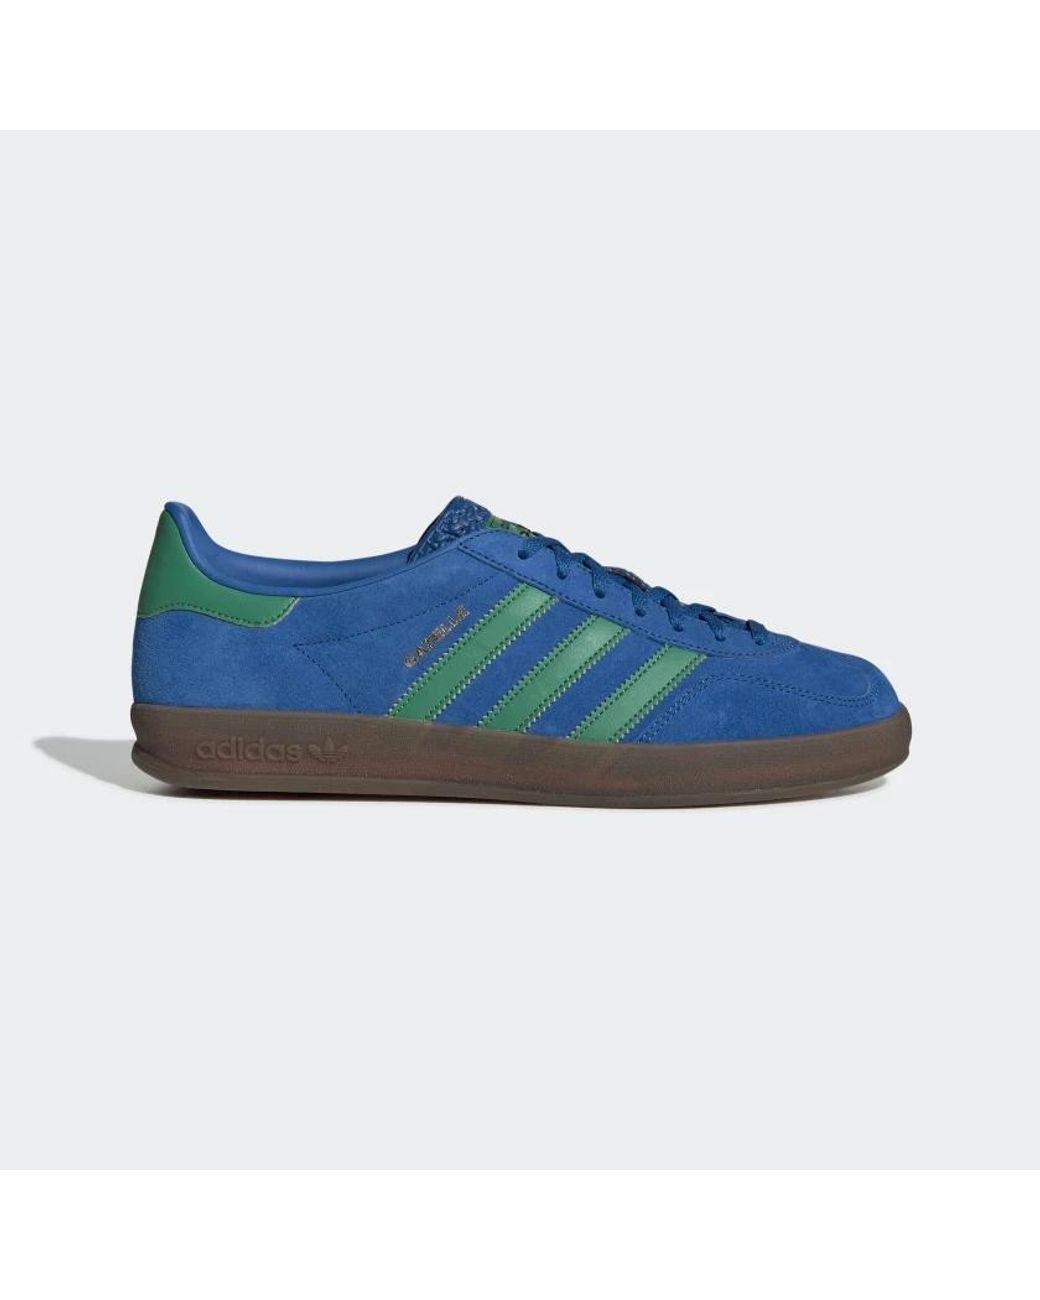 adidas Suede Gazelle Indoor Blue & Green Ee5735 - Save 49% - Lyst